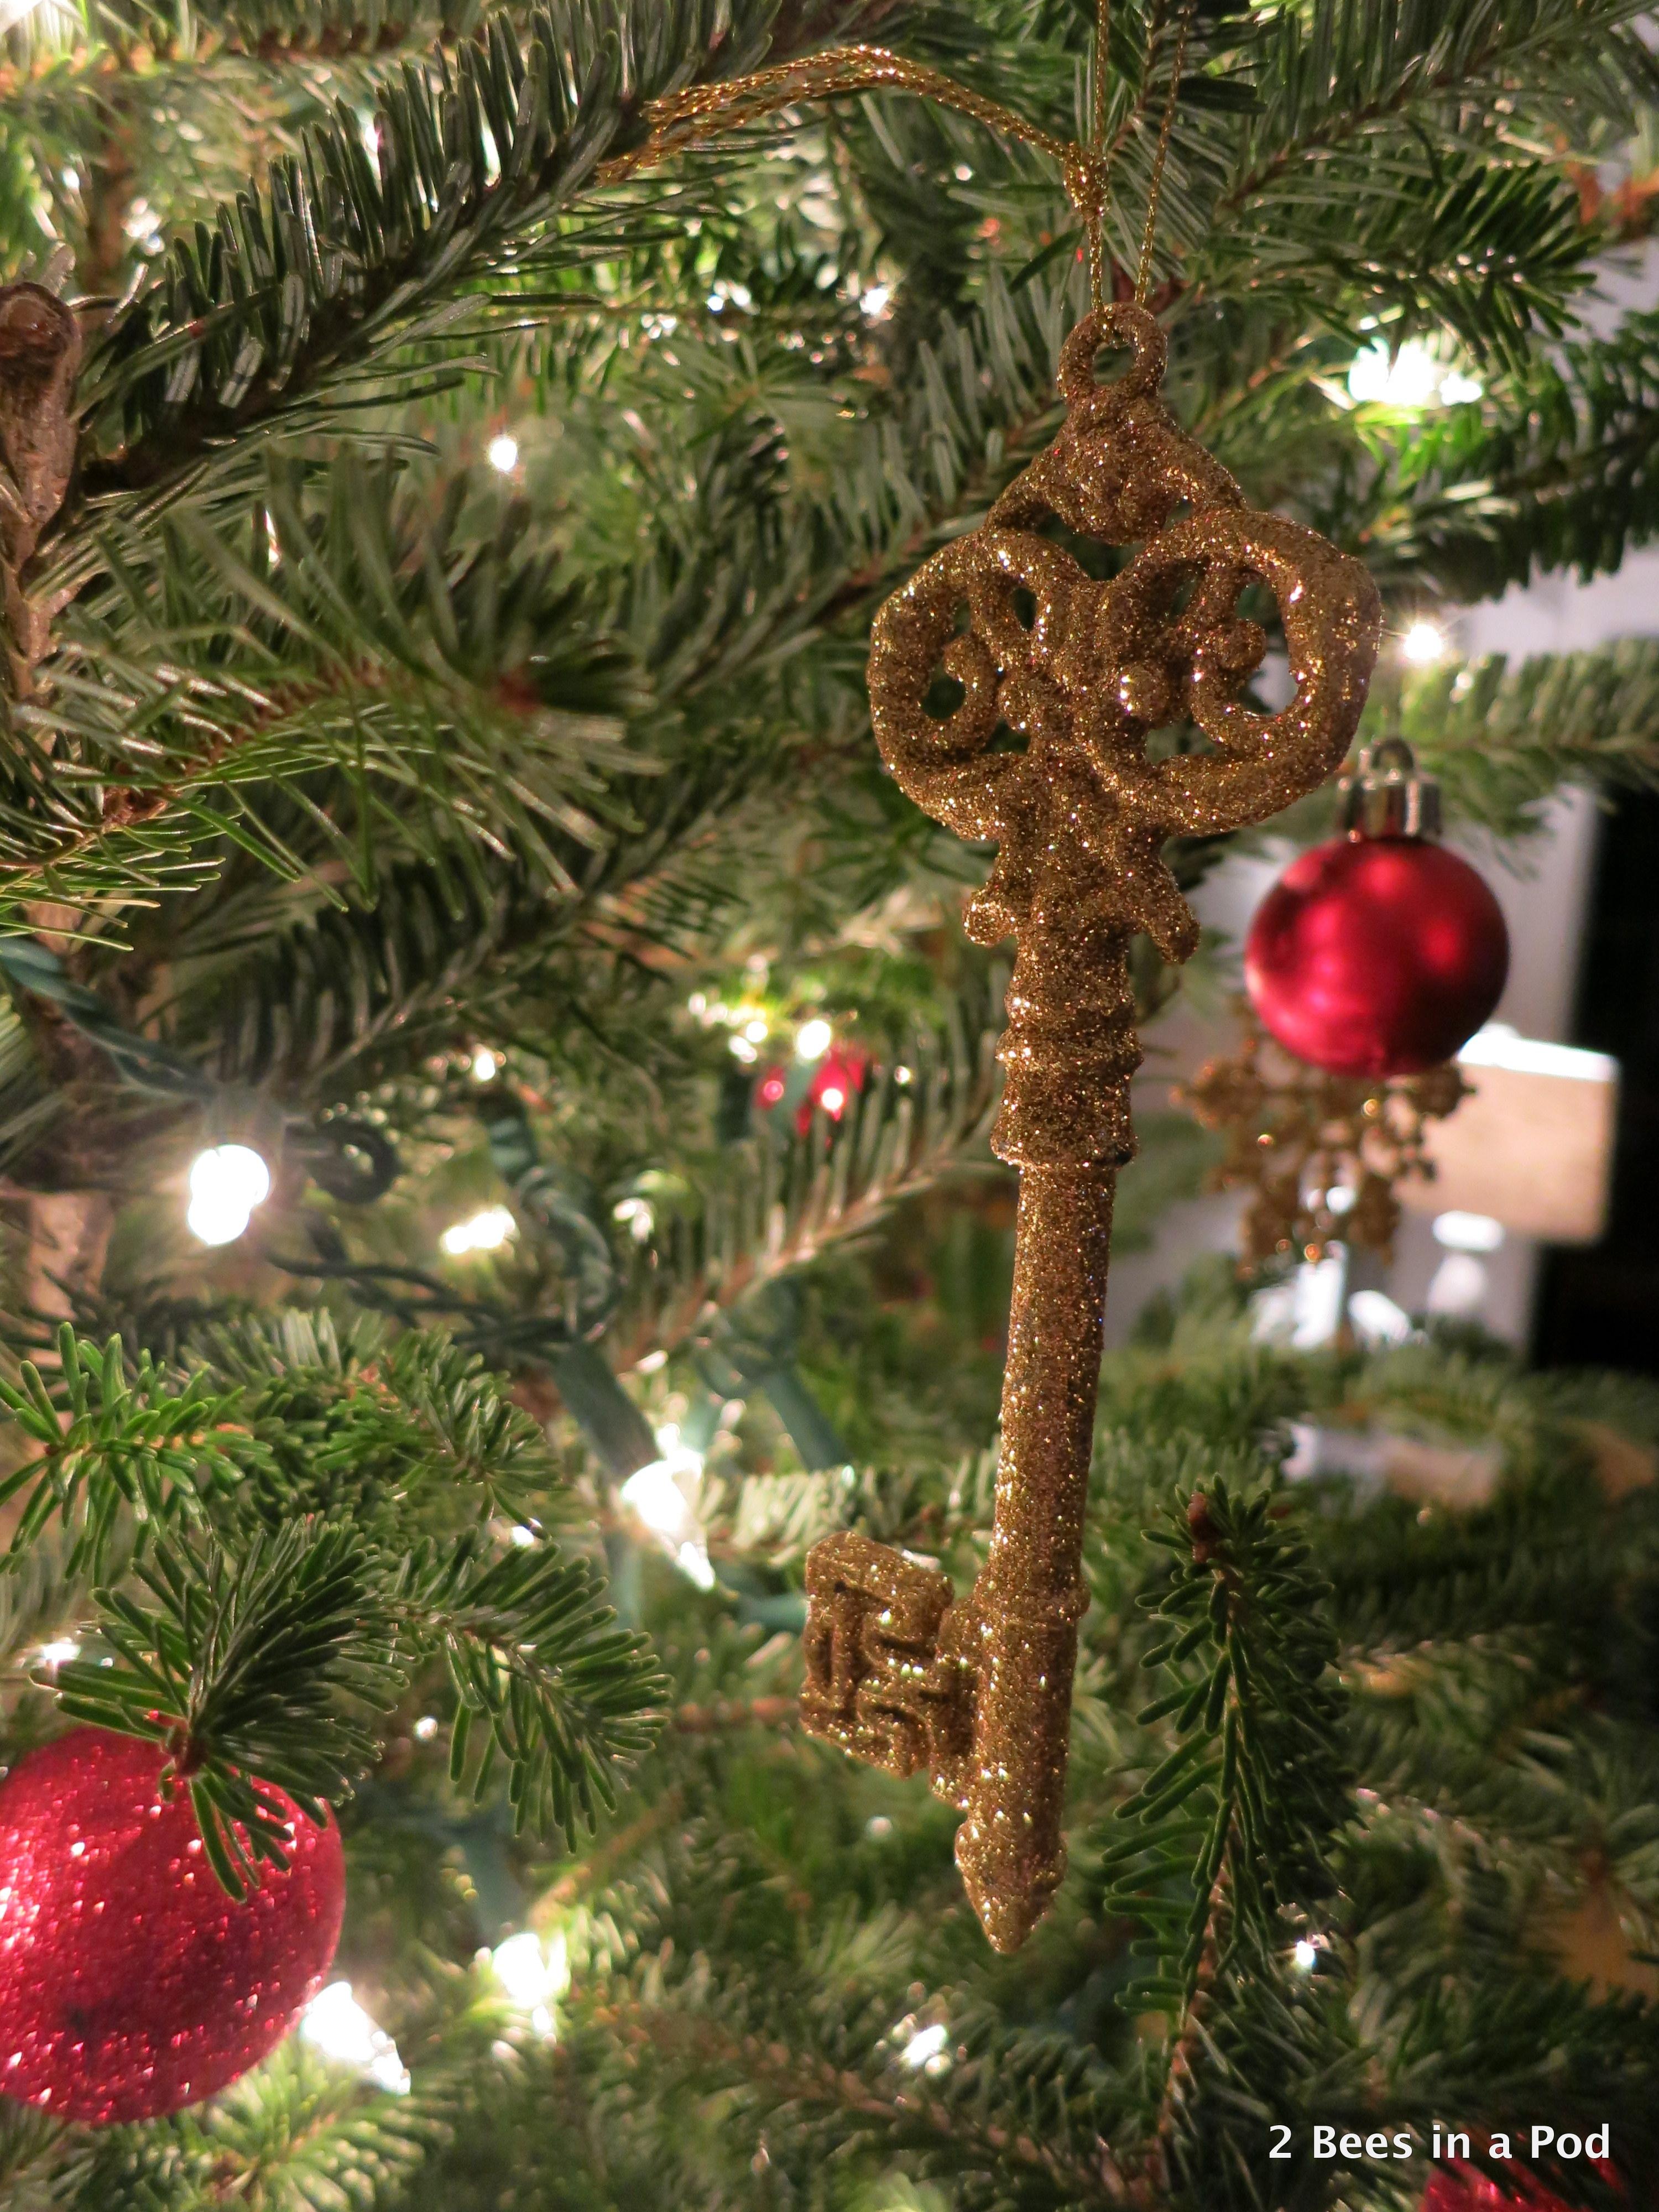 Christmas Home Tour. Christmas Tree with Gold Skeleton Key Ornament